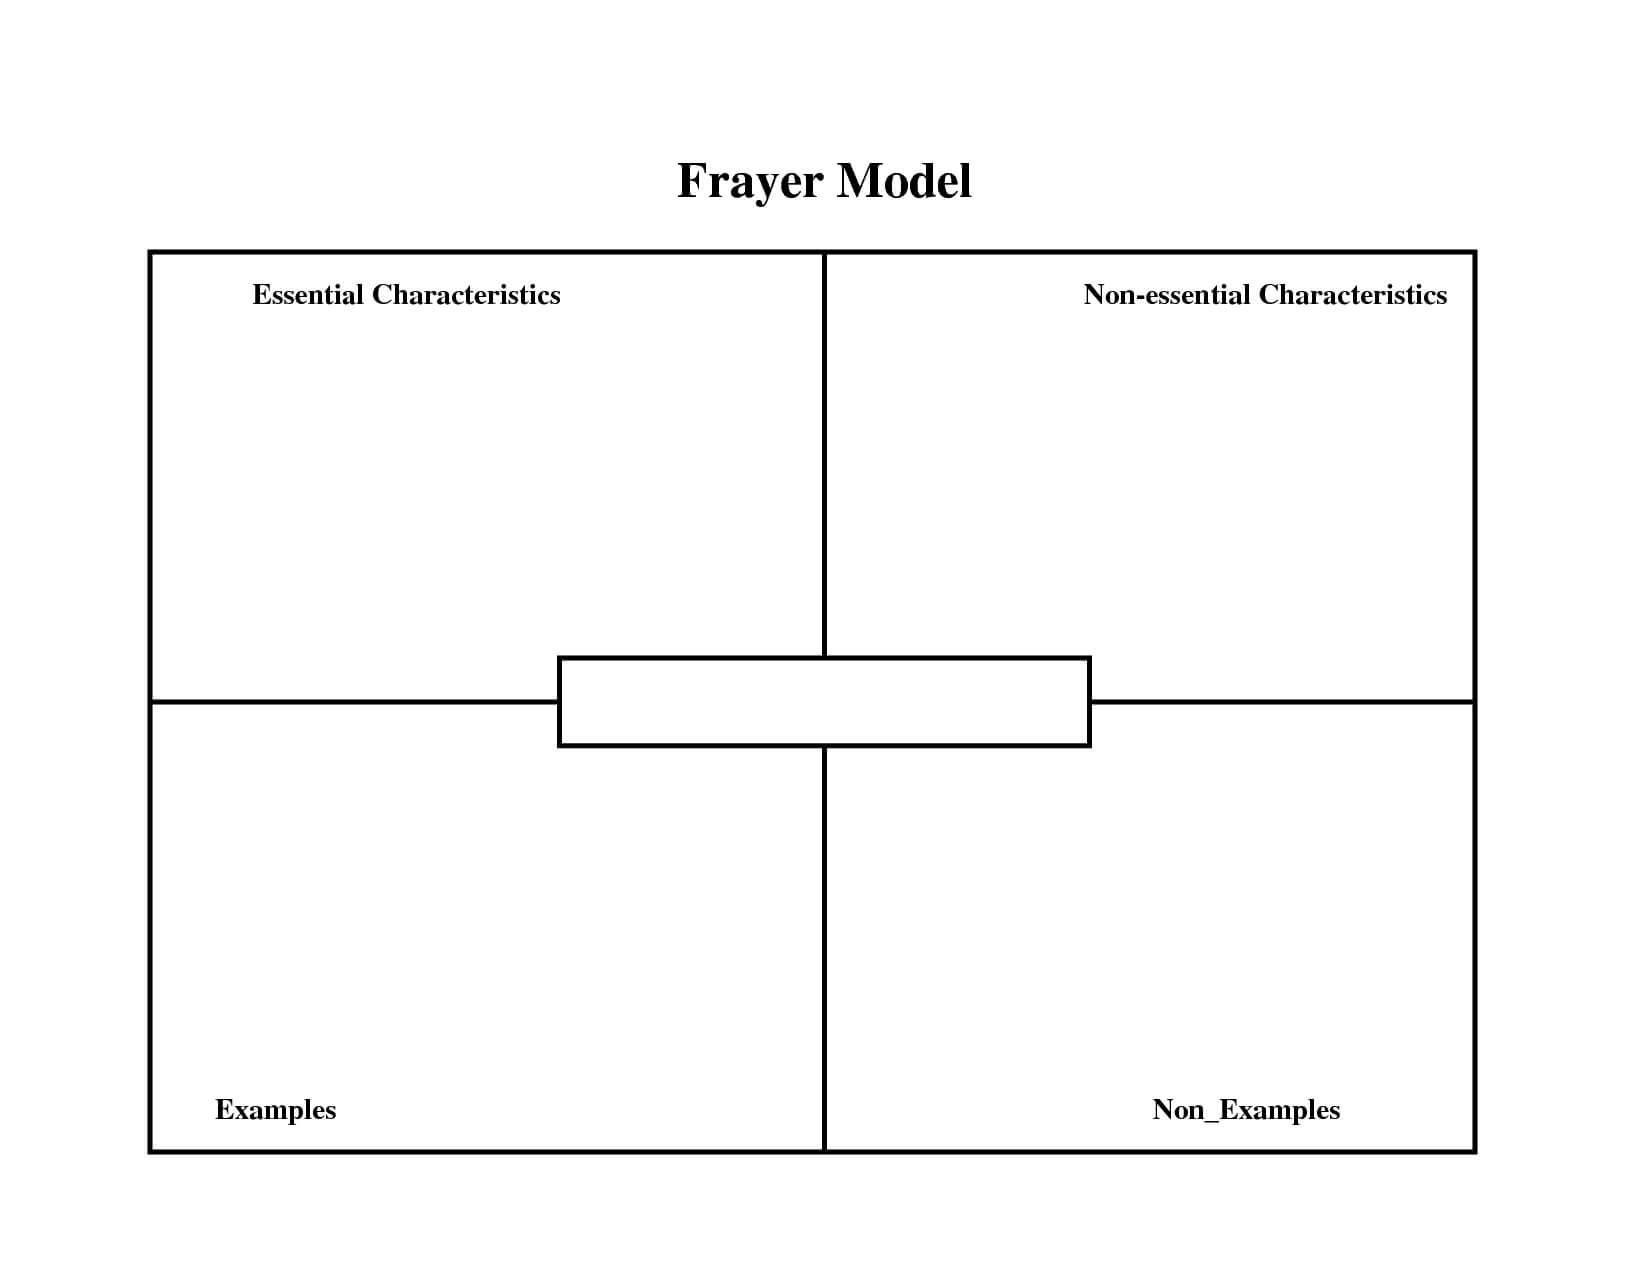 Best Photos Of Frayer Model Microsoft Word - Frayer Model inside Blank Frayer Model Template